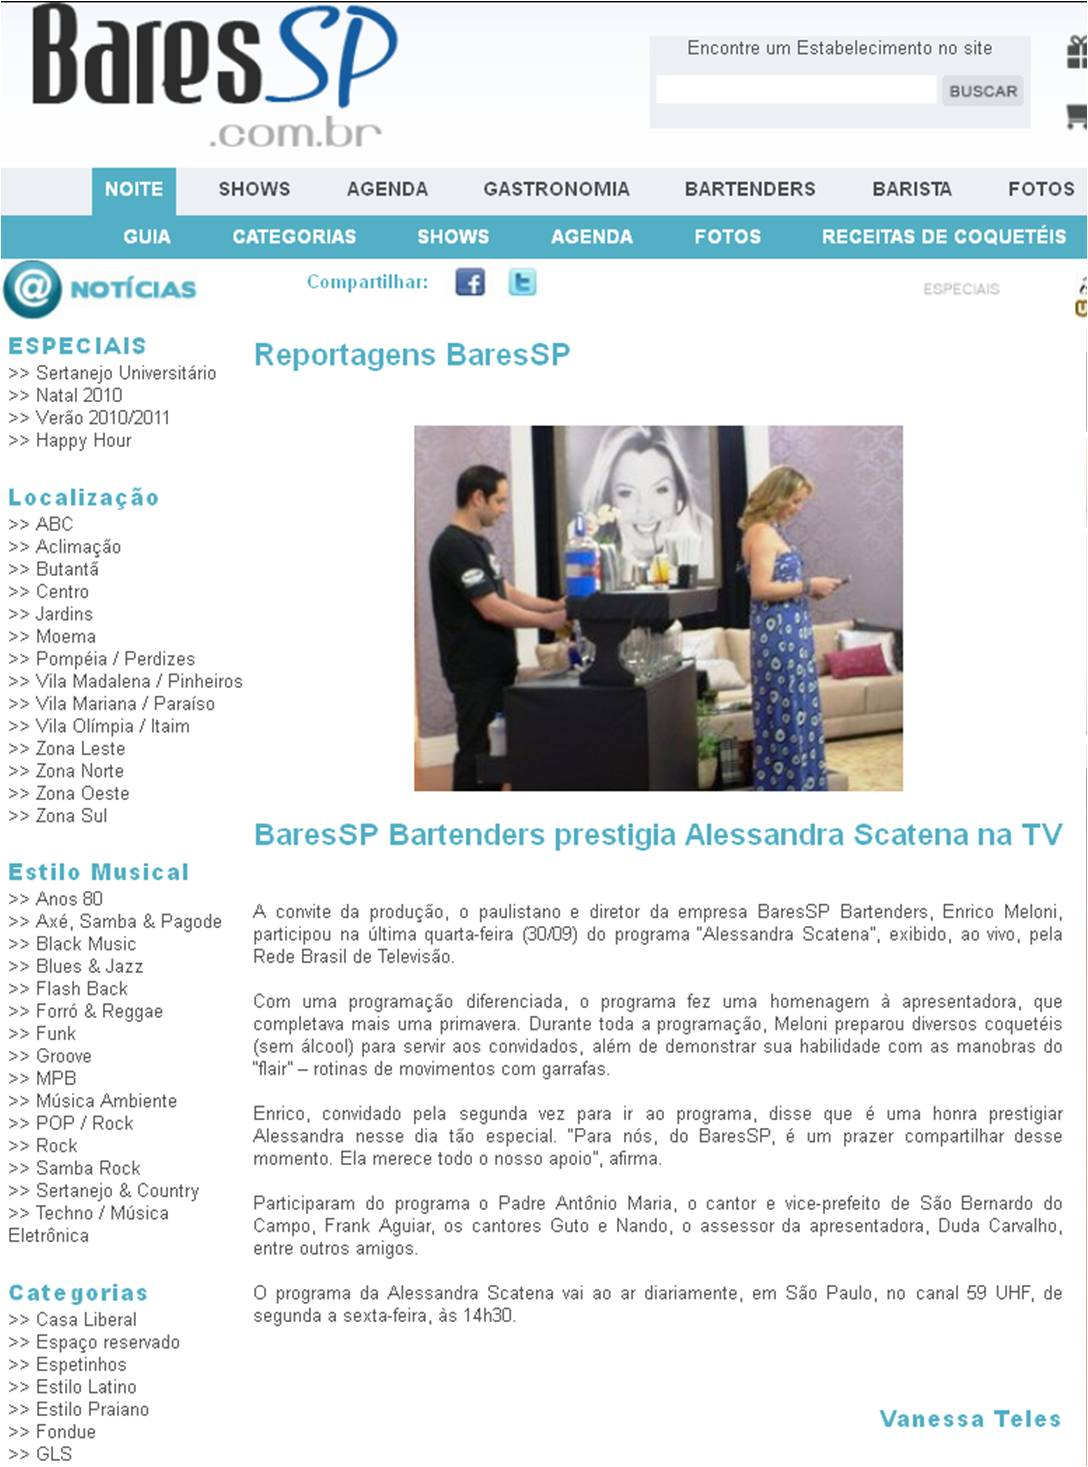 BaresSP Bartenders prestigia Alessandra Scatena na TV